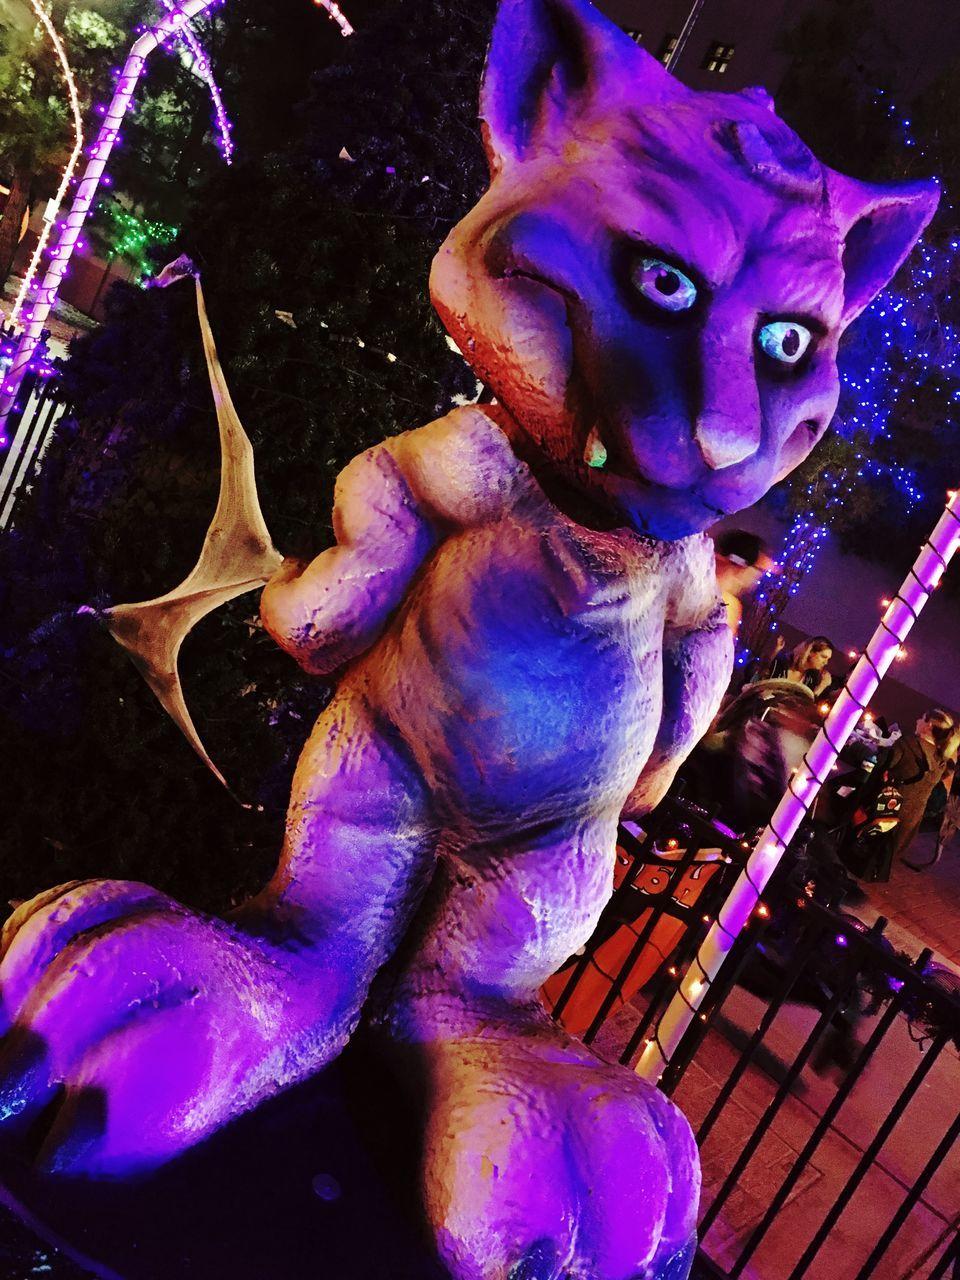 statue, art and craft, night, sculpture, no people, indoors, illuminated, close-up, animal themes, carousel